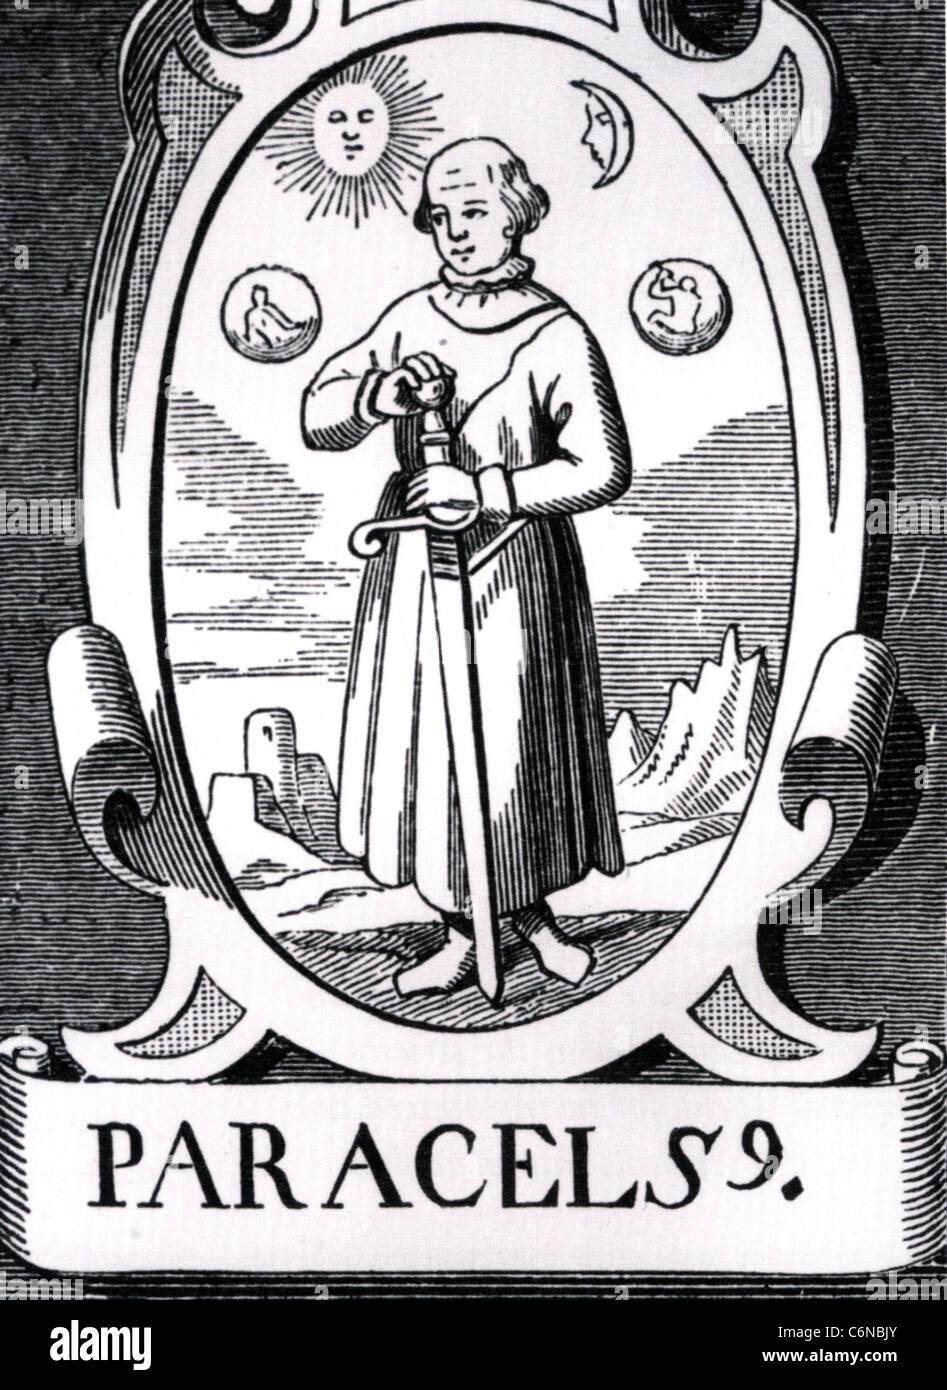 PARACELSUS (1493-1541) Swiss physician, alchemist and botanist - Stock Image